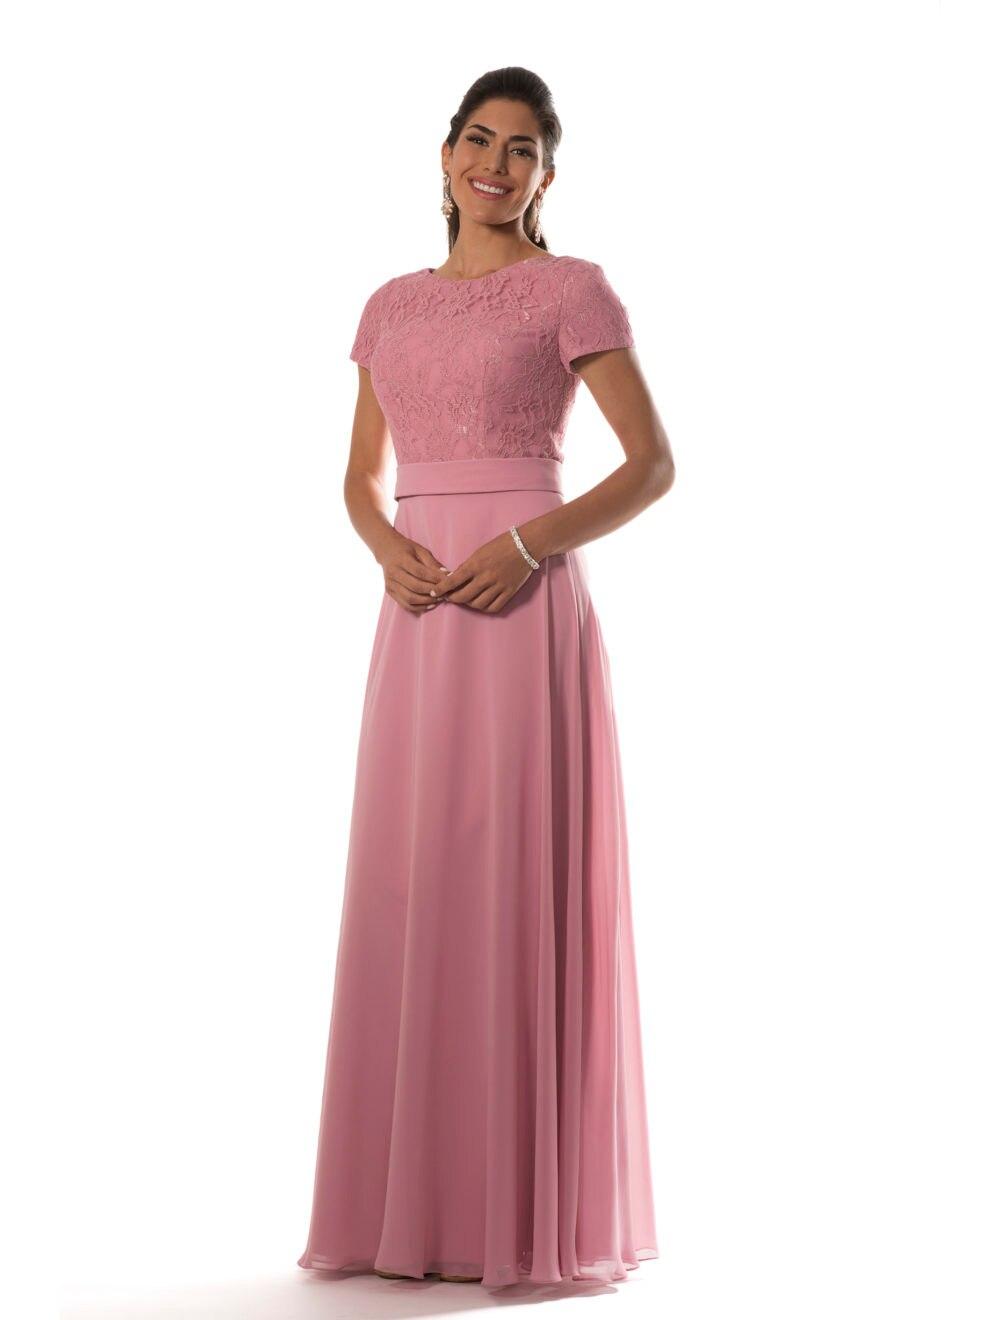 Asombroso Vestidos De Dama Largas O Cortas Imagen - Colección de ...